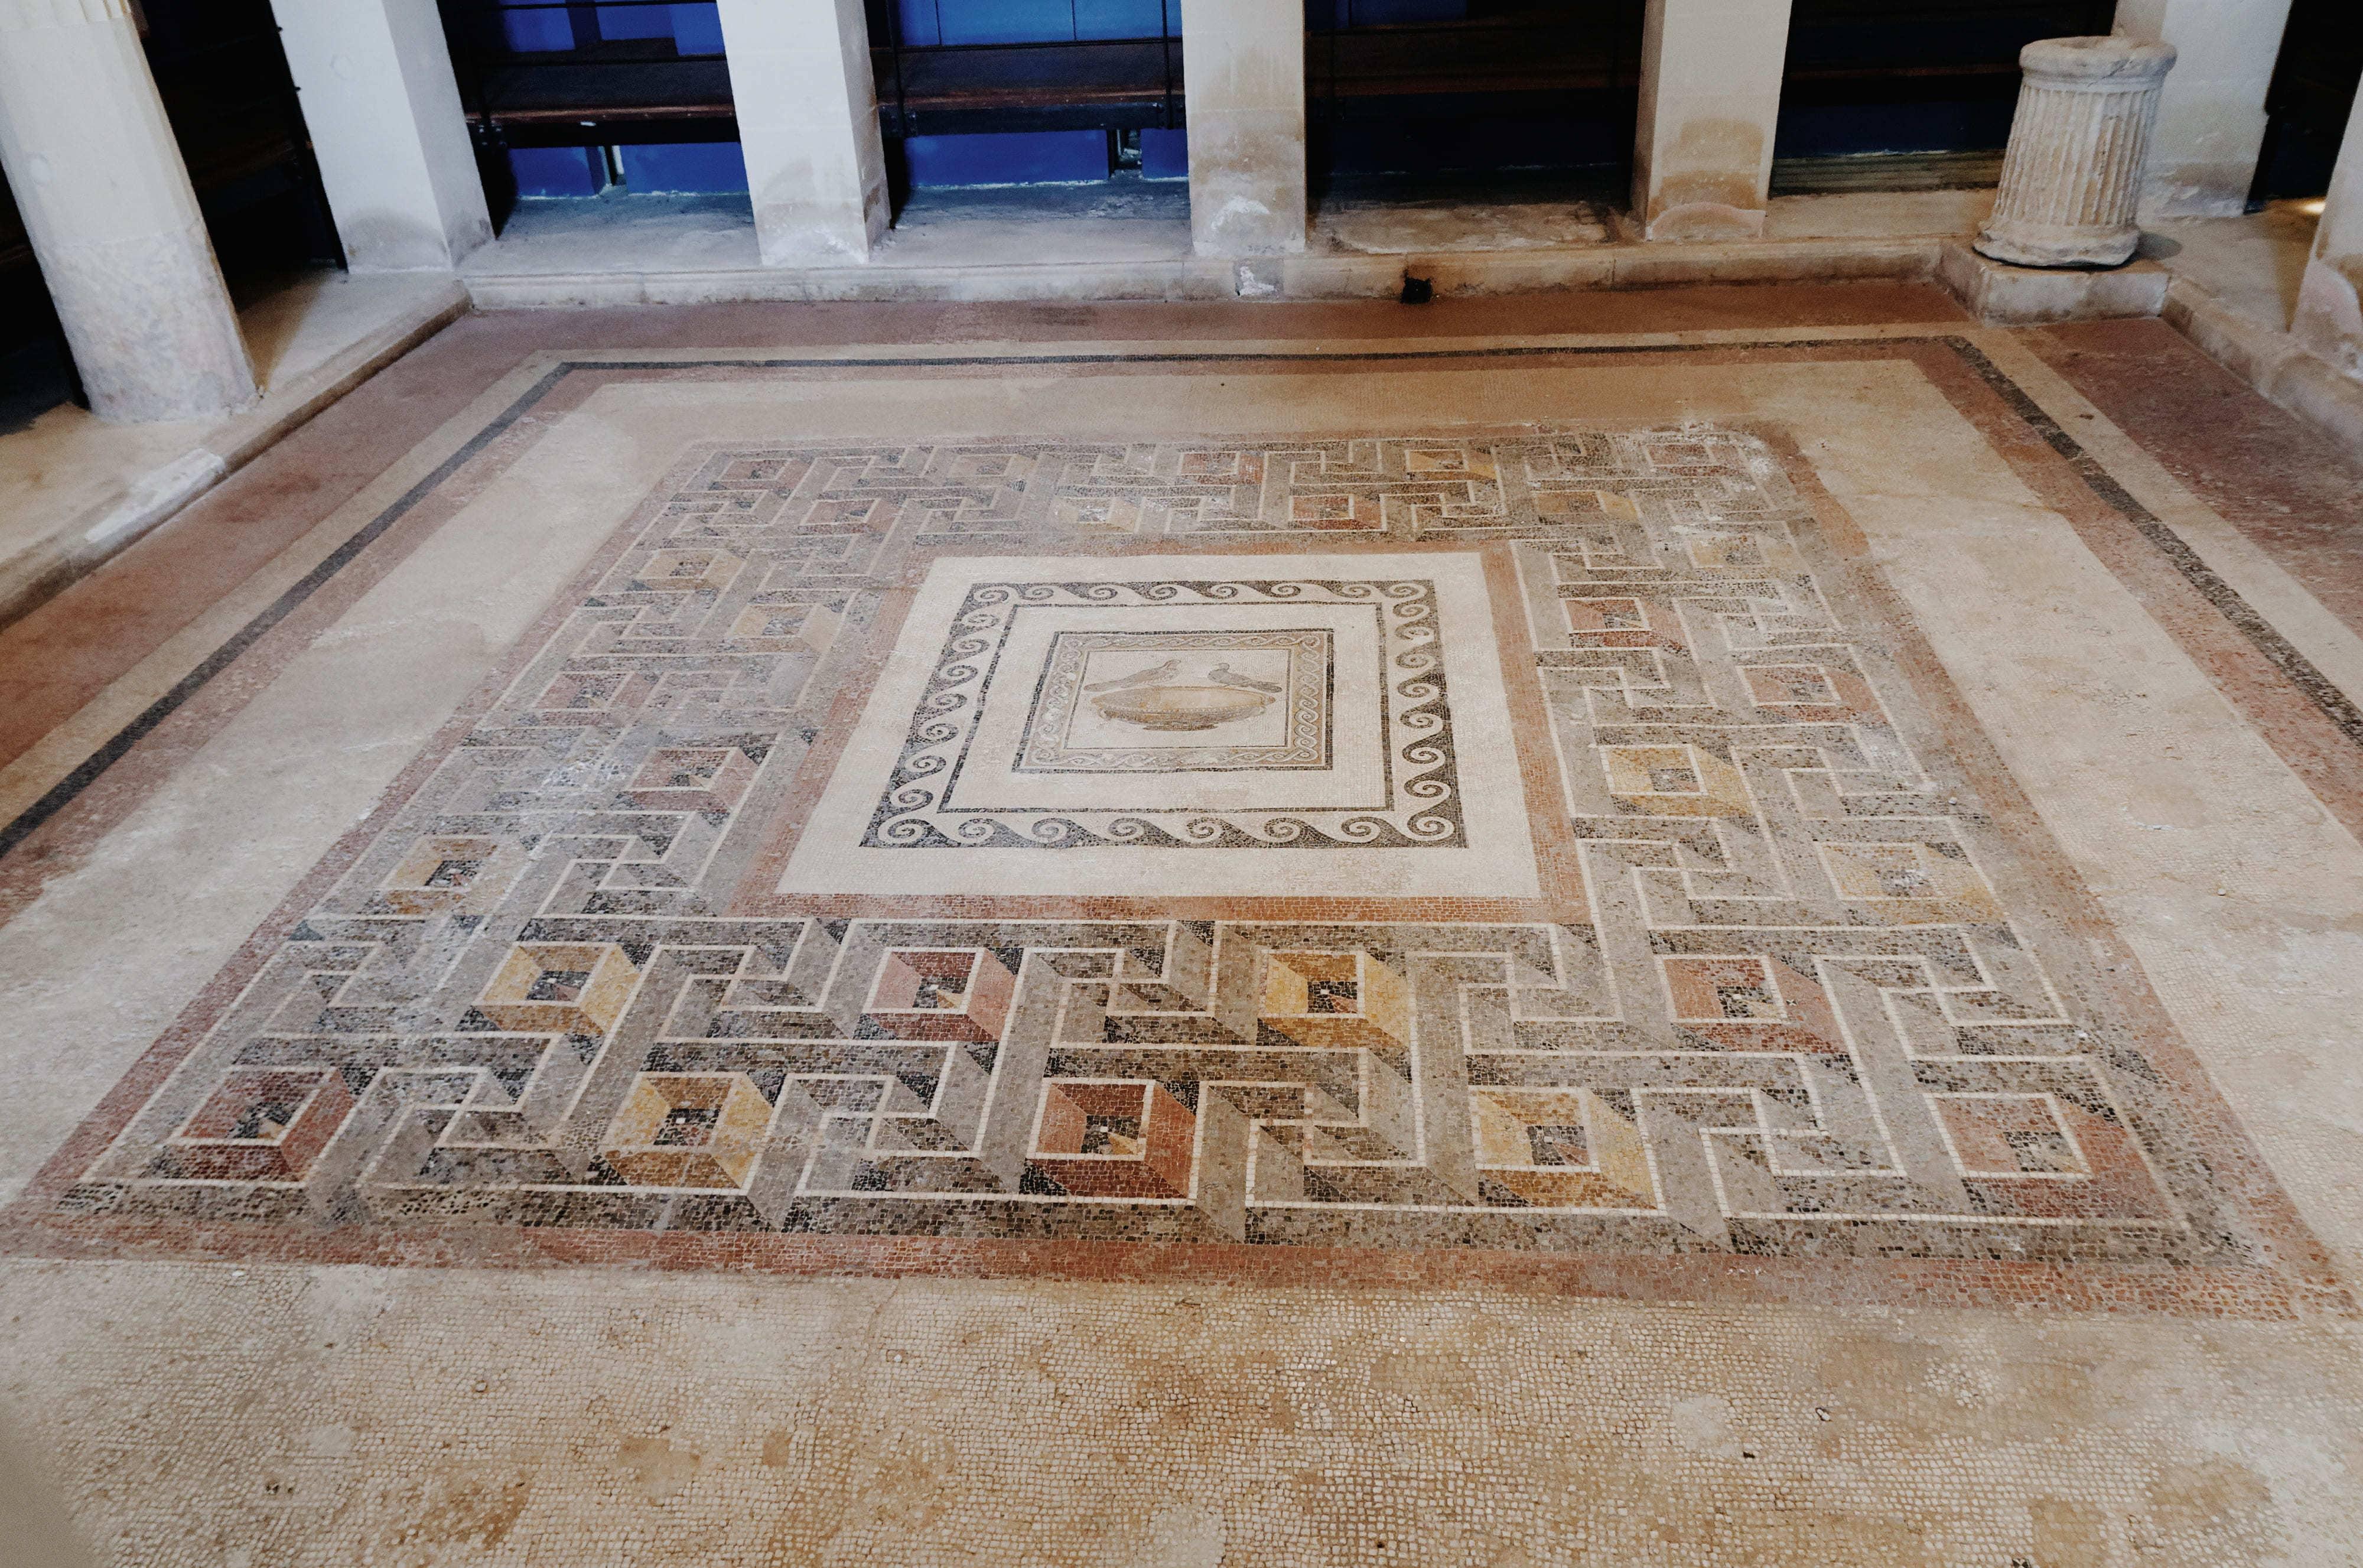 Le Domus Romane di Palazzo Valentini, mosaics, travel, Rome